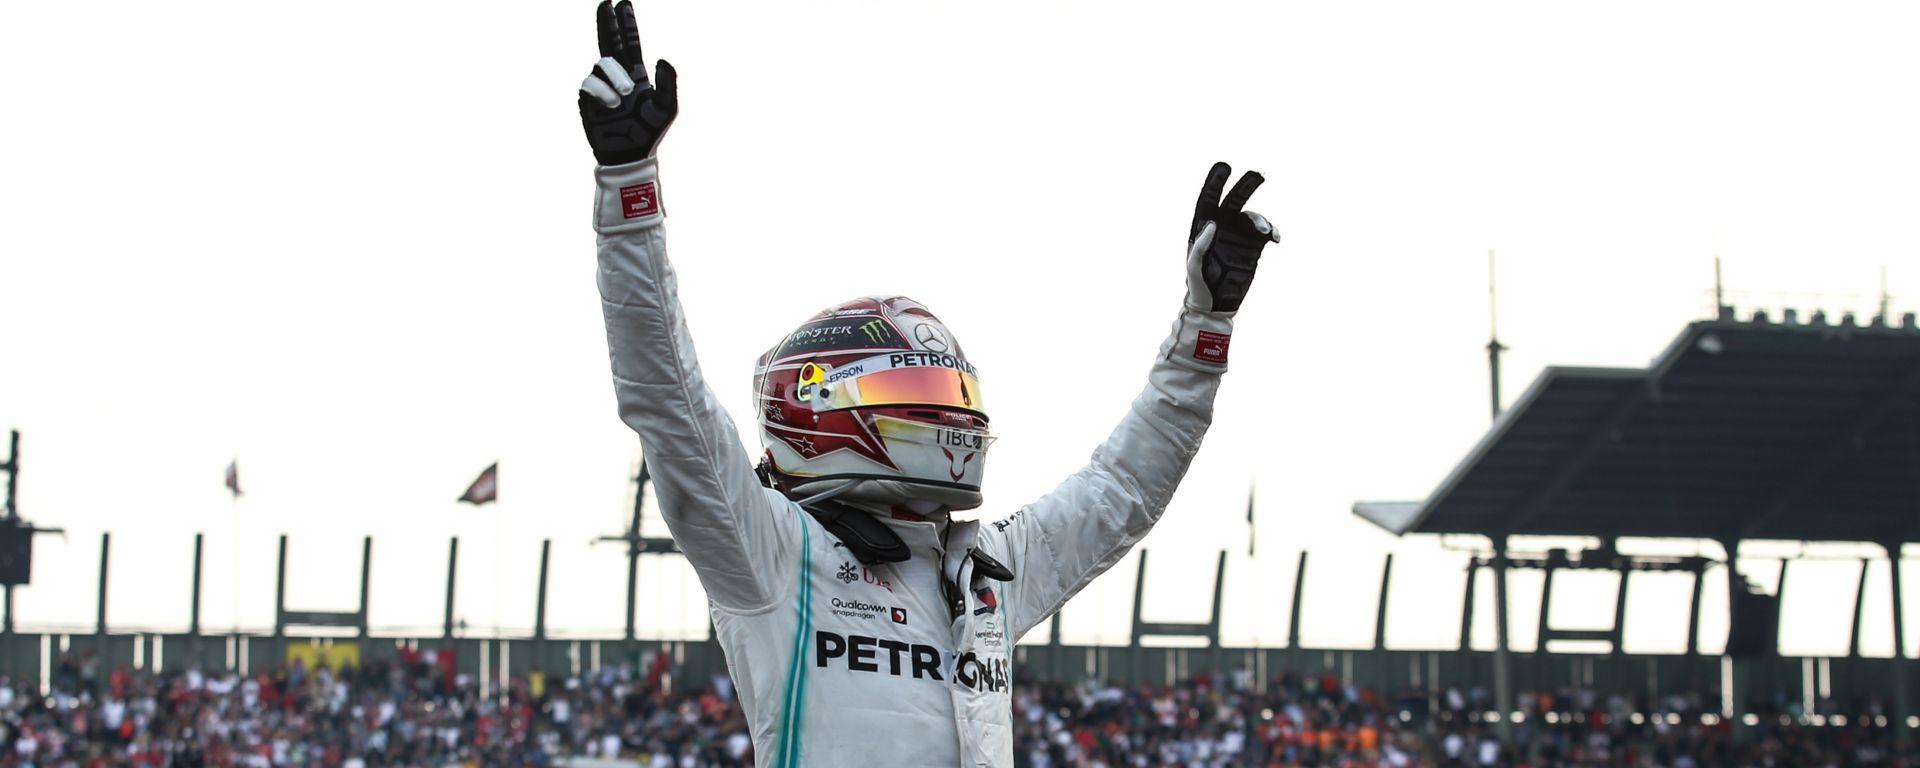 F1, GP Messico 2019: Lewis Hamilton (Mercedes) festeggia la vittoria